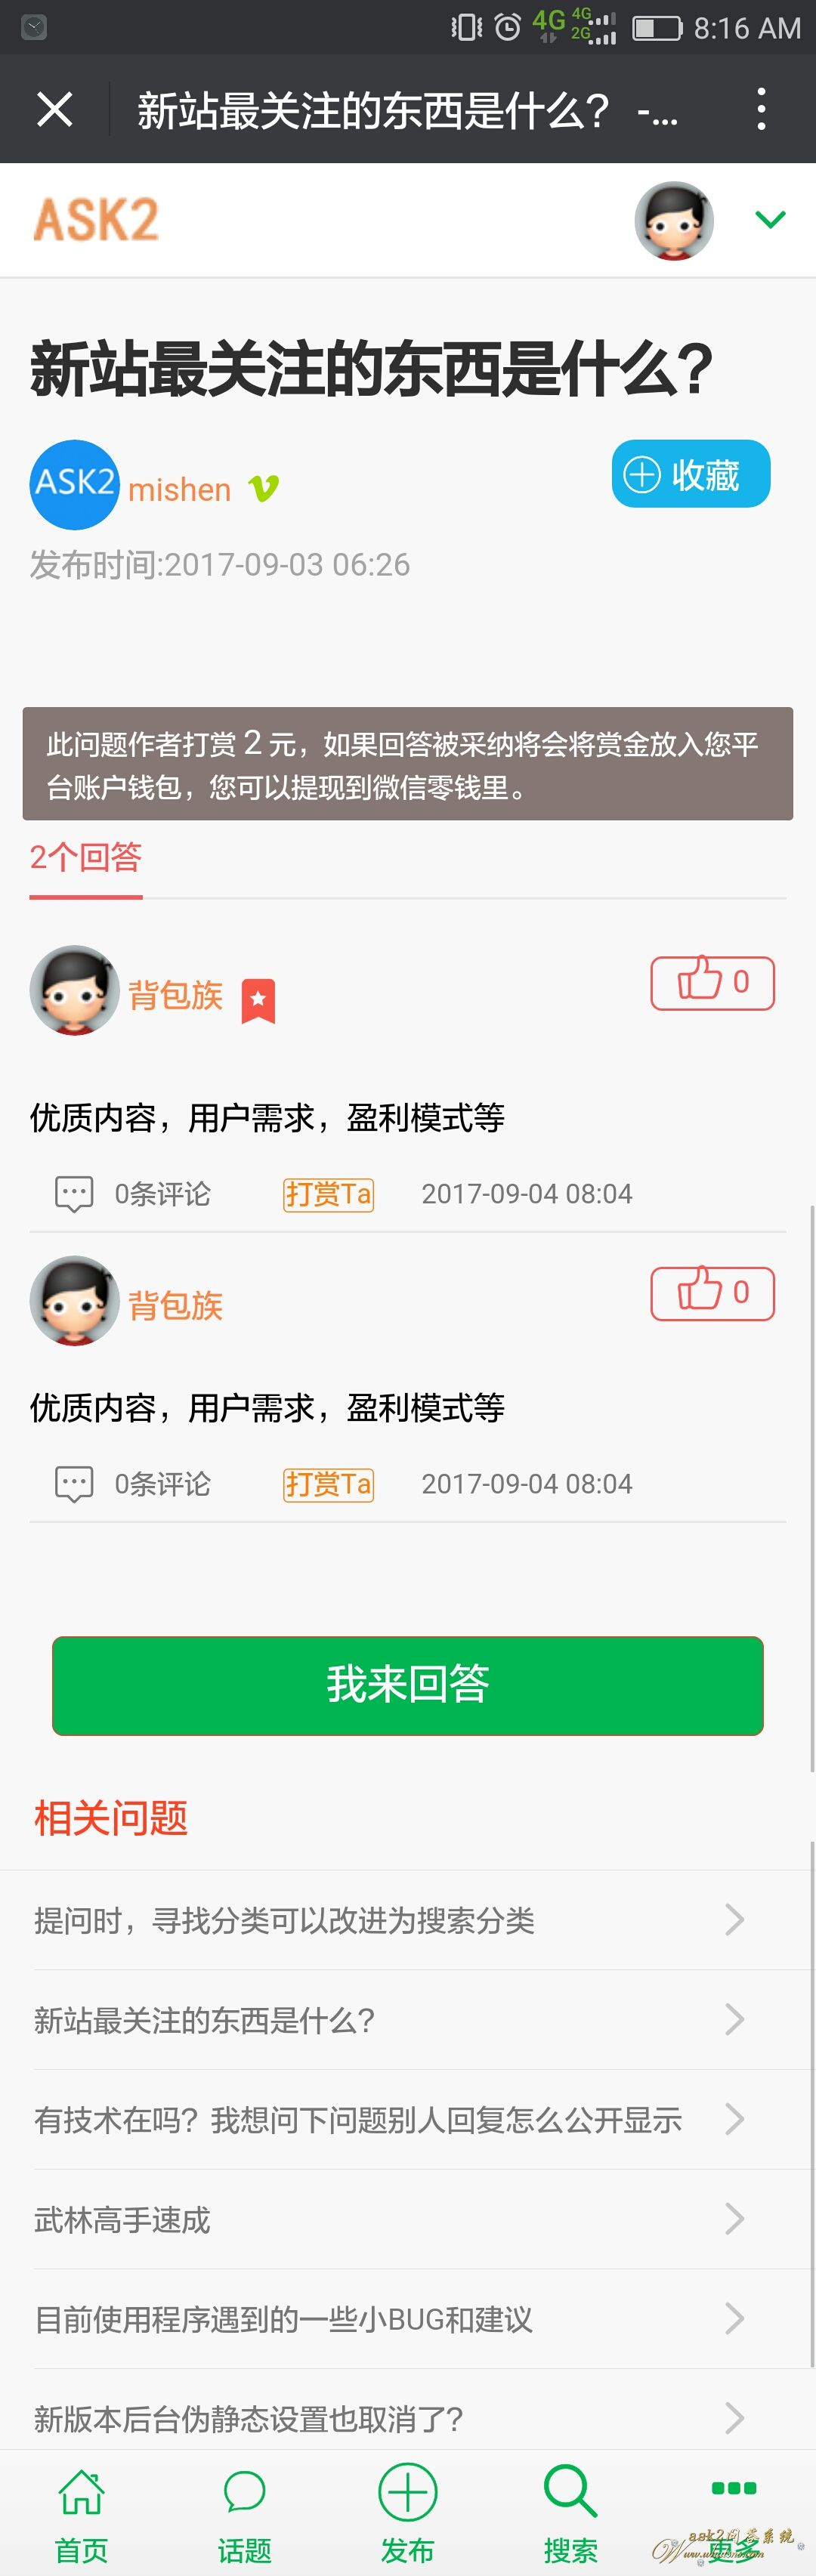 Screenshot_2017-09-11-08-16-12